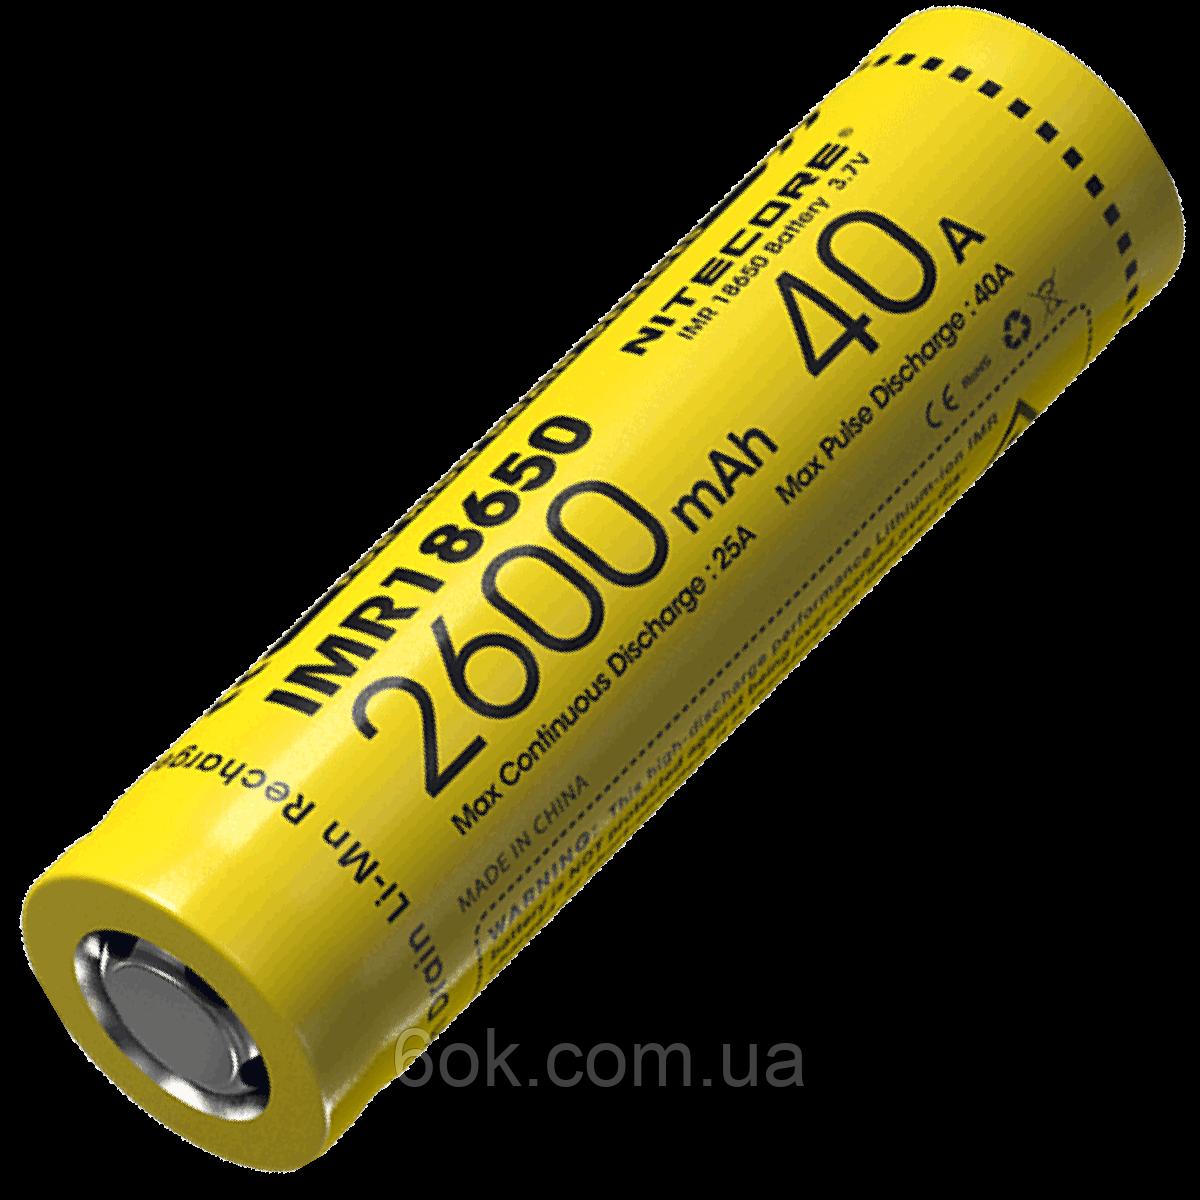 Аккумулятор IMR18650 (2600mAh, 40A)